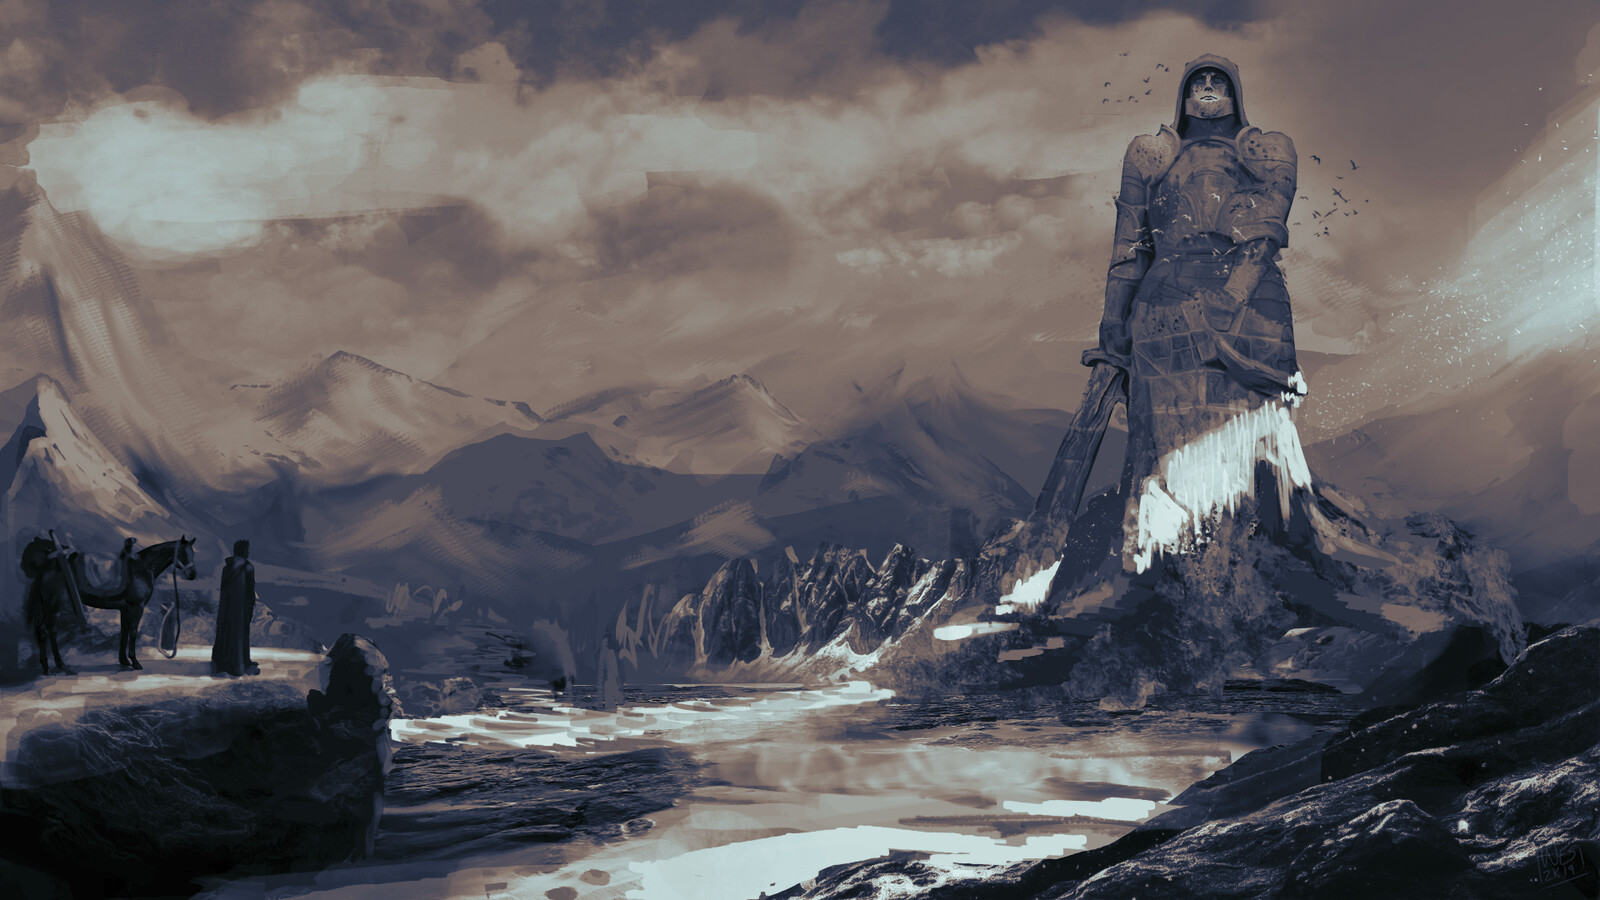 The Fallen Knight of Valhalla